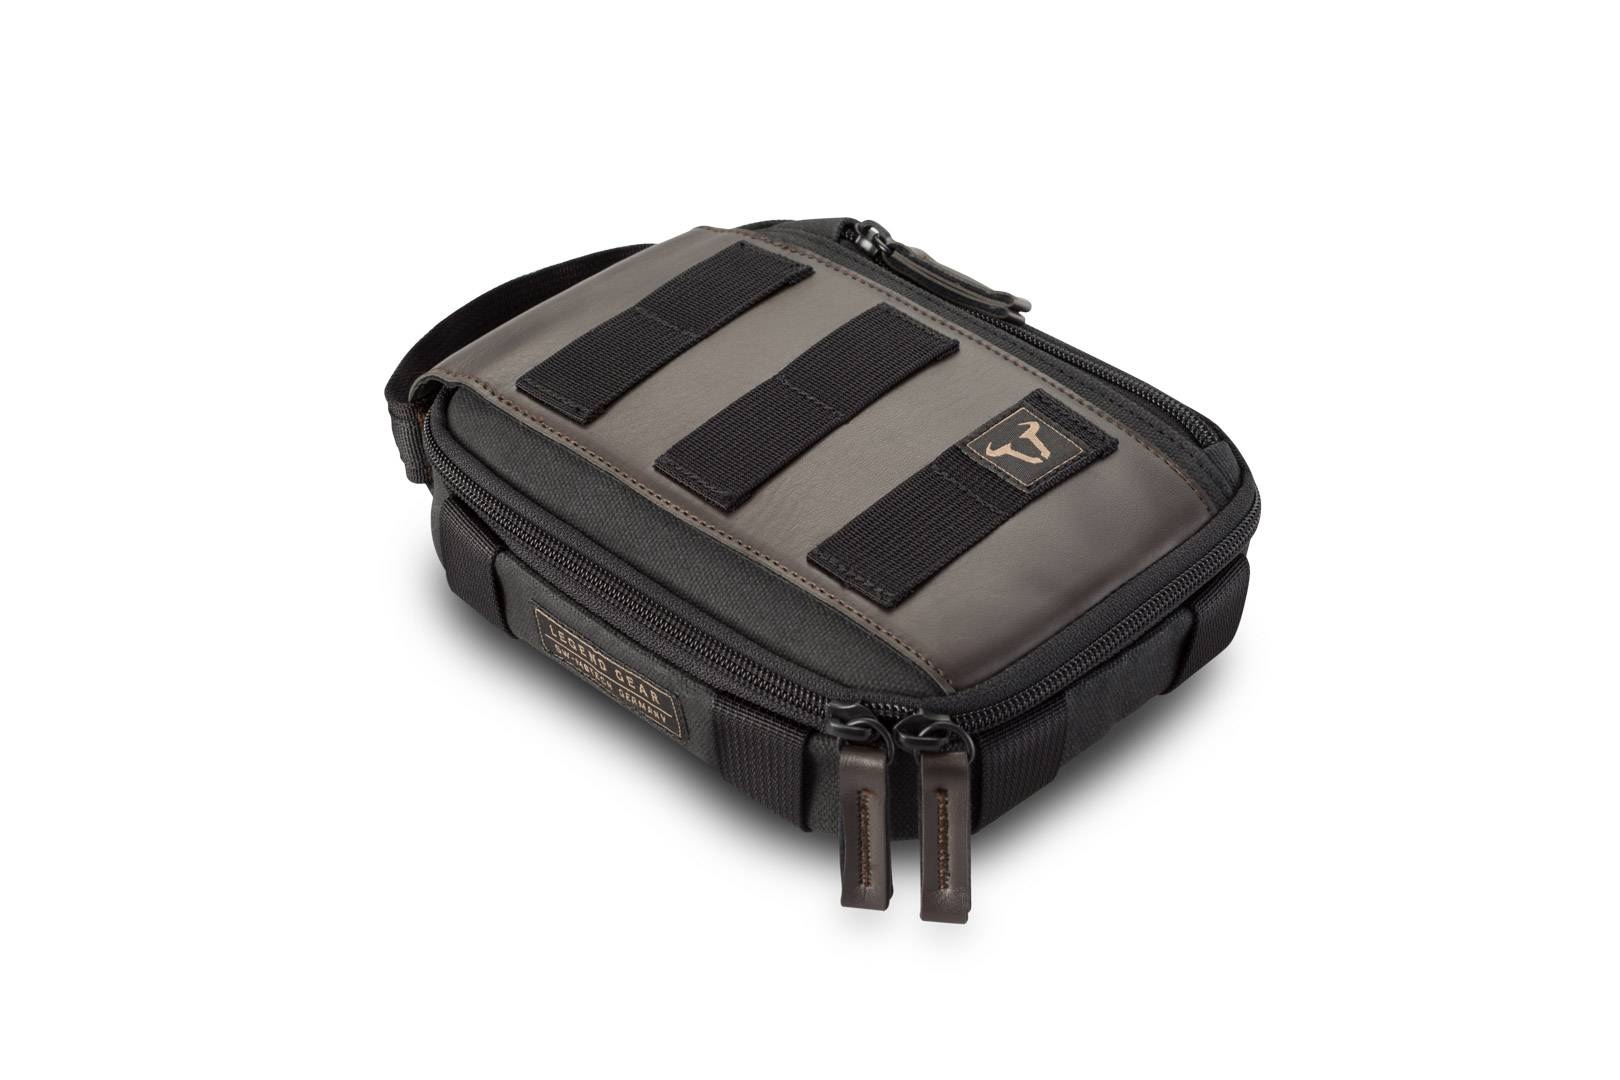 SW-Motech Legend Gear accessory bag LA2 - 1.2 l. Splash-proof. accessory bag LA2 1,2 Liter Splash-proof